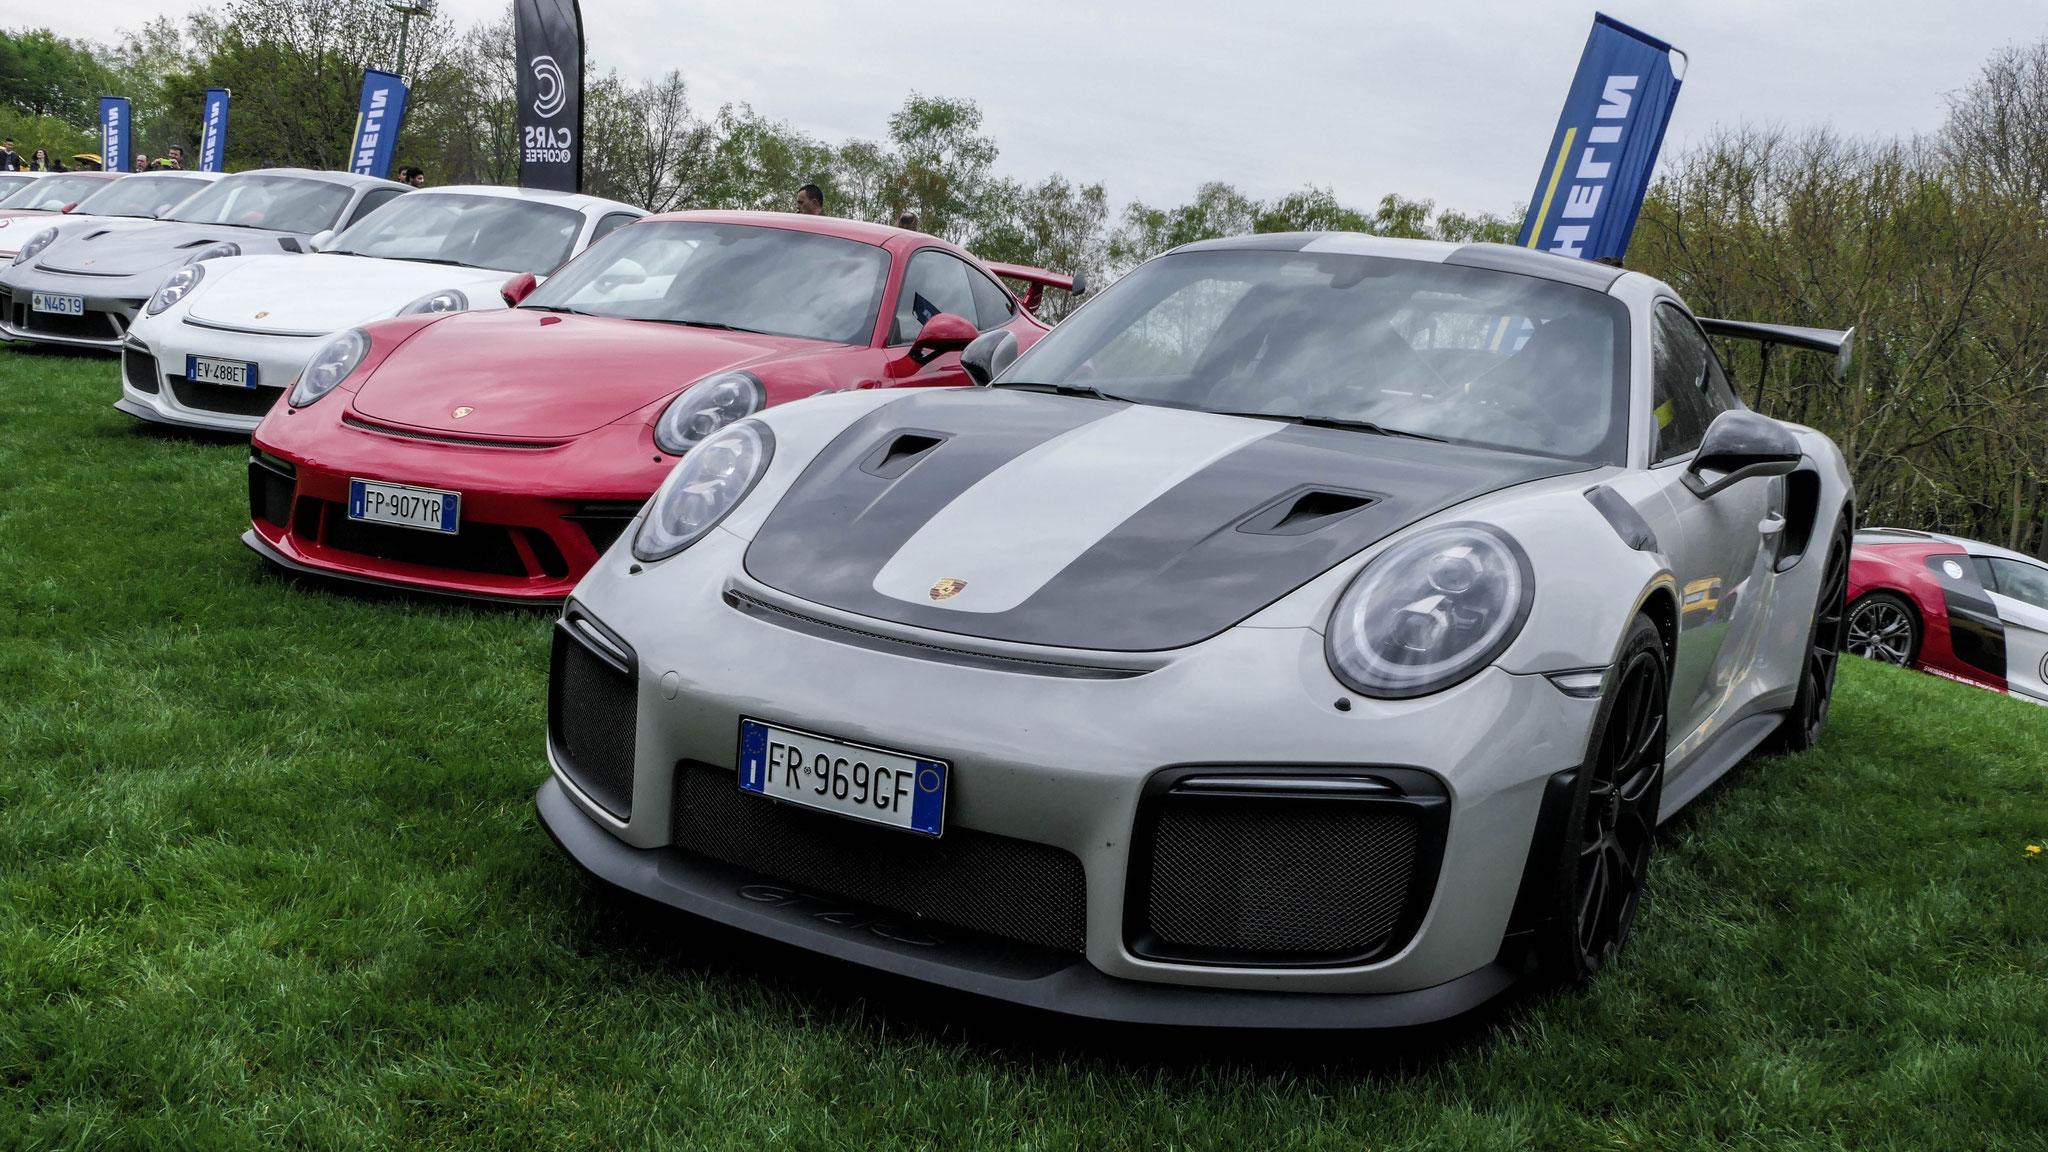 Porsche GT2 RS - FR-969-GF (ITA)